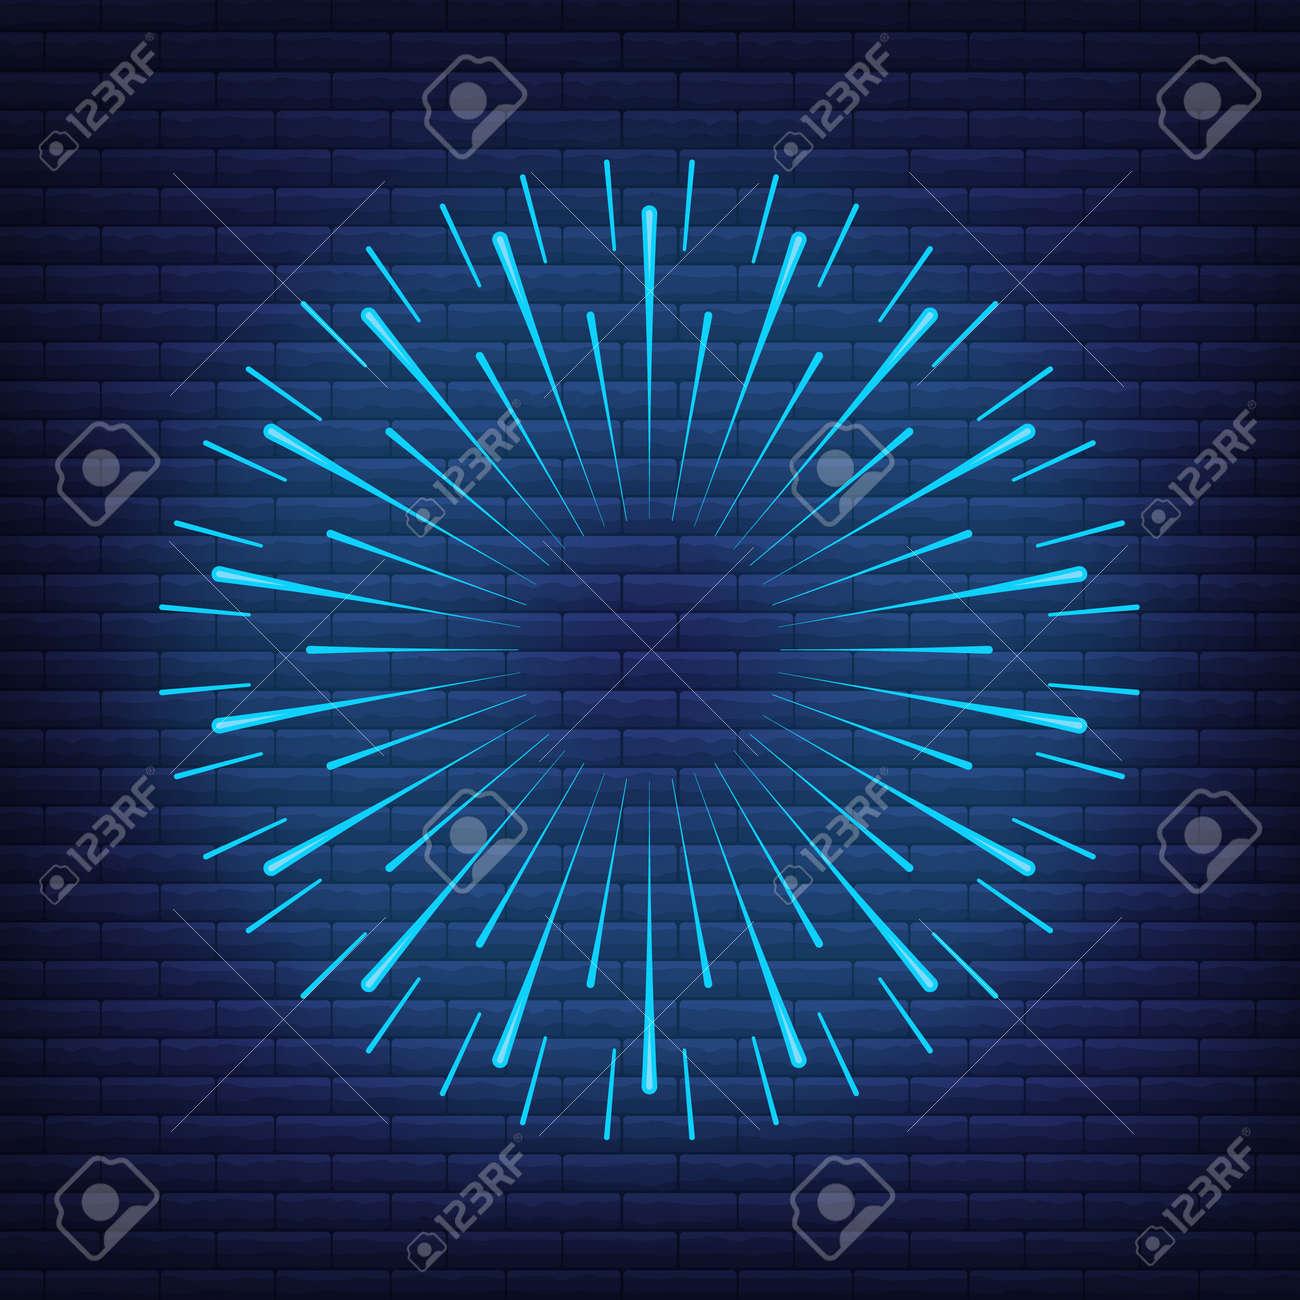 Retro design light sunburst neon style glow geometric shape, vintage rays sunlight explosion icon concept vector illustration, isolated on black wall. Minimal blue firework burst label, sunbeam badge. - 168394851